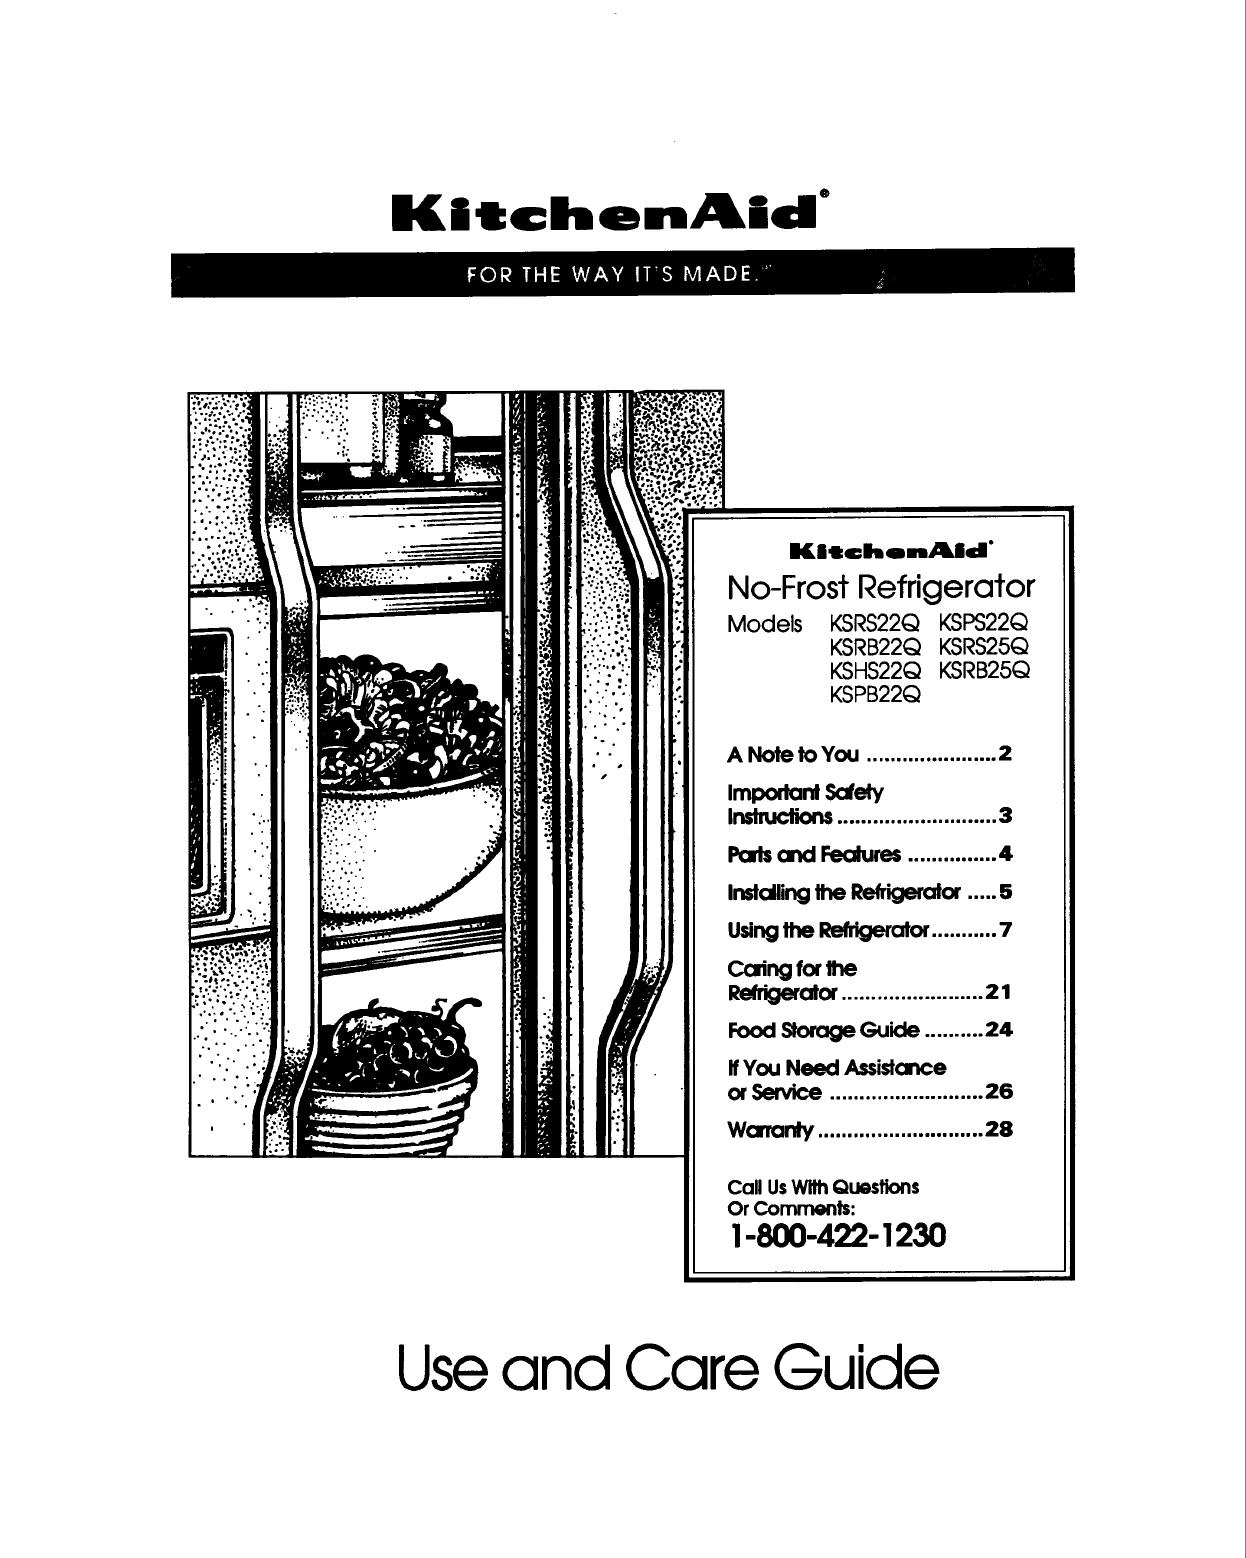 Kitchenaid Superba Owners Manual